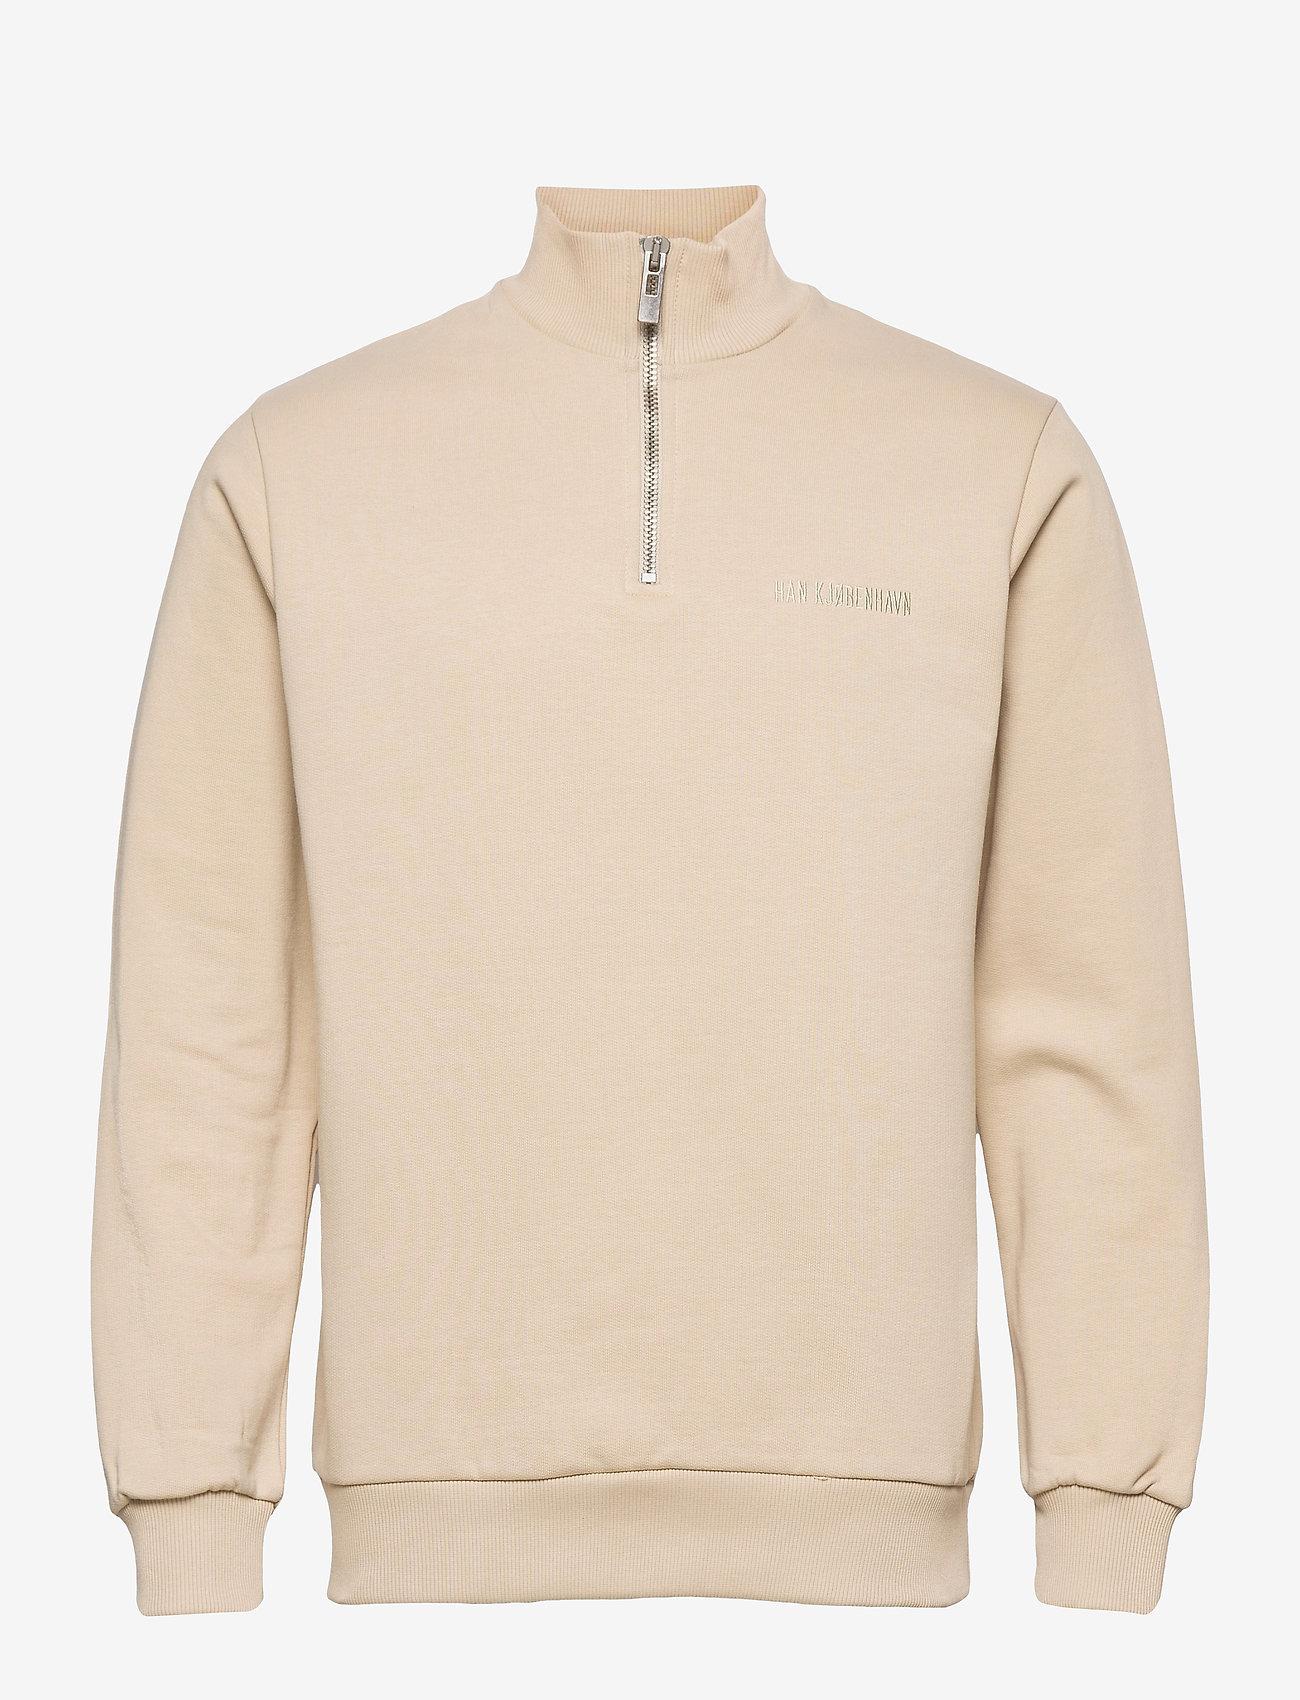 HAN Kjøbenhavn - Half Zip Sweat - basic sweatshirts - sand - 0